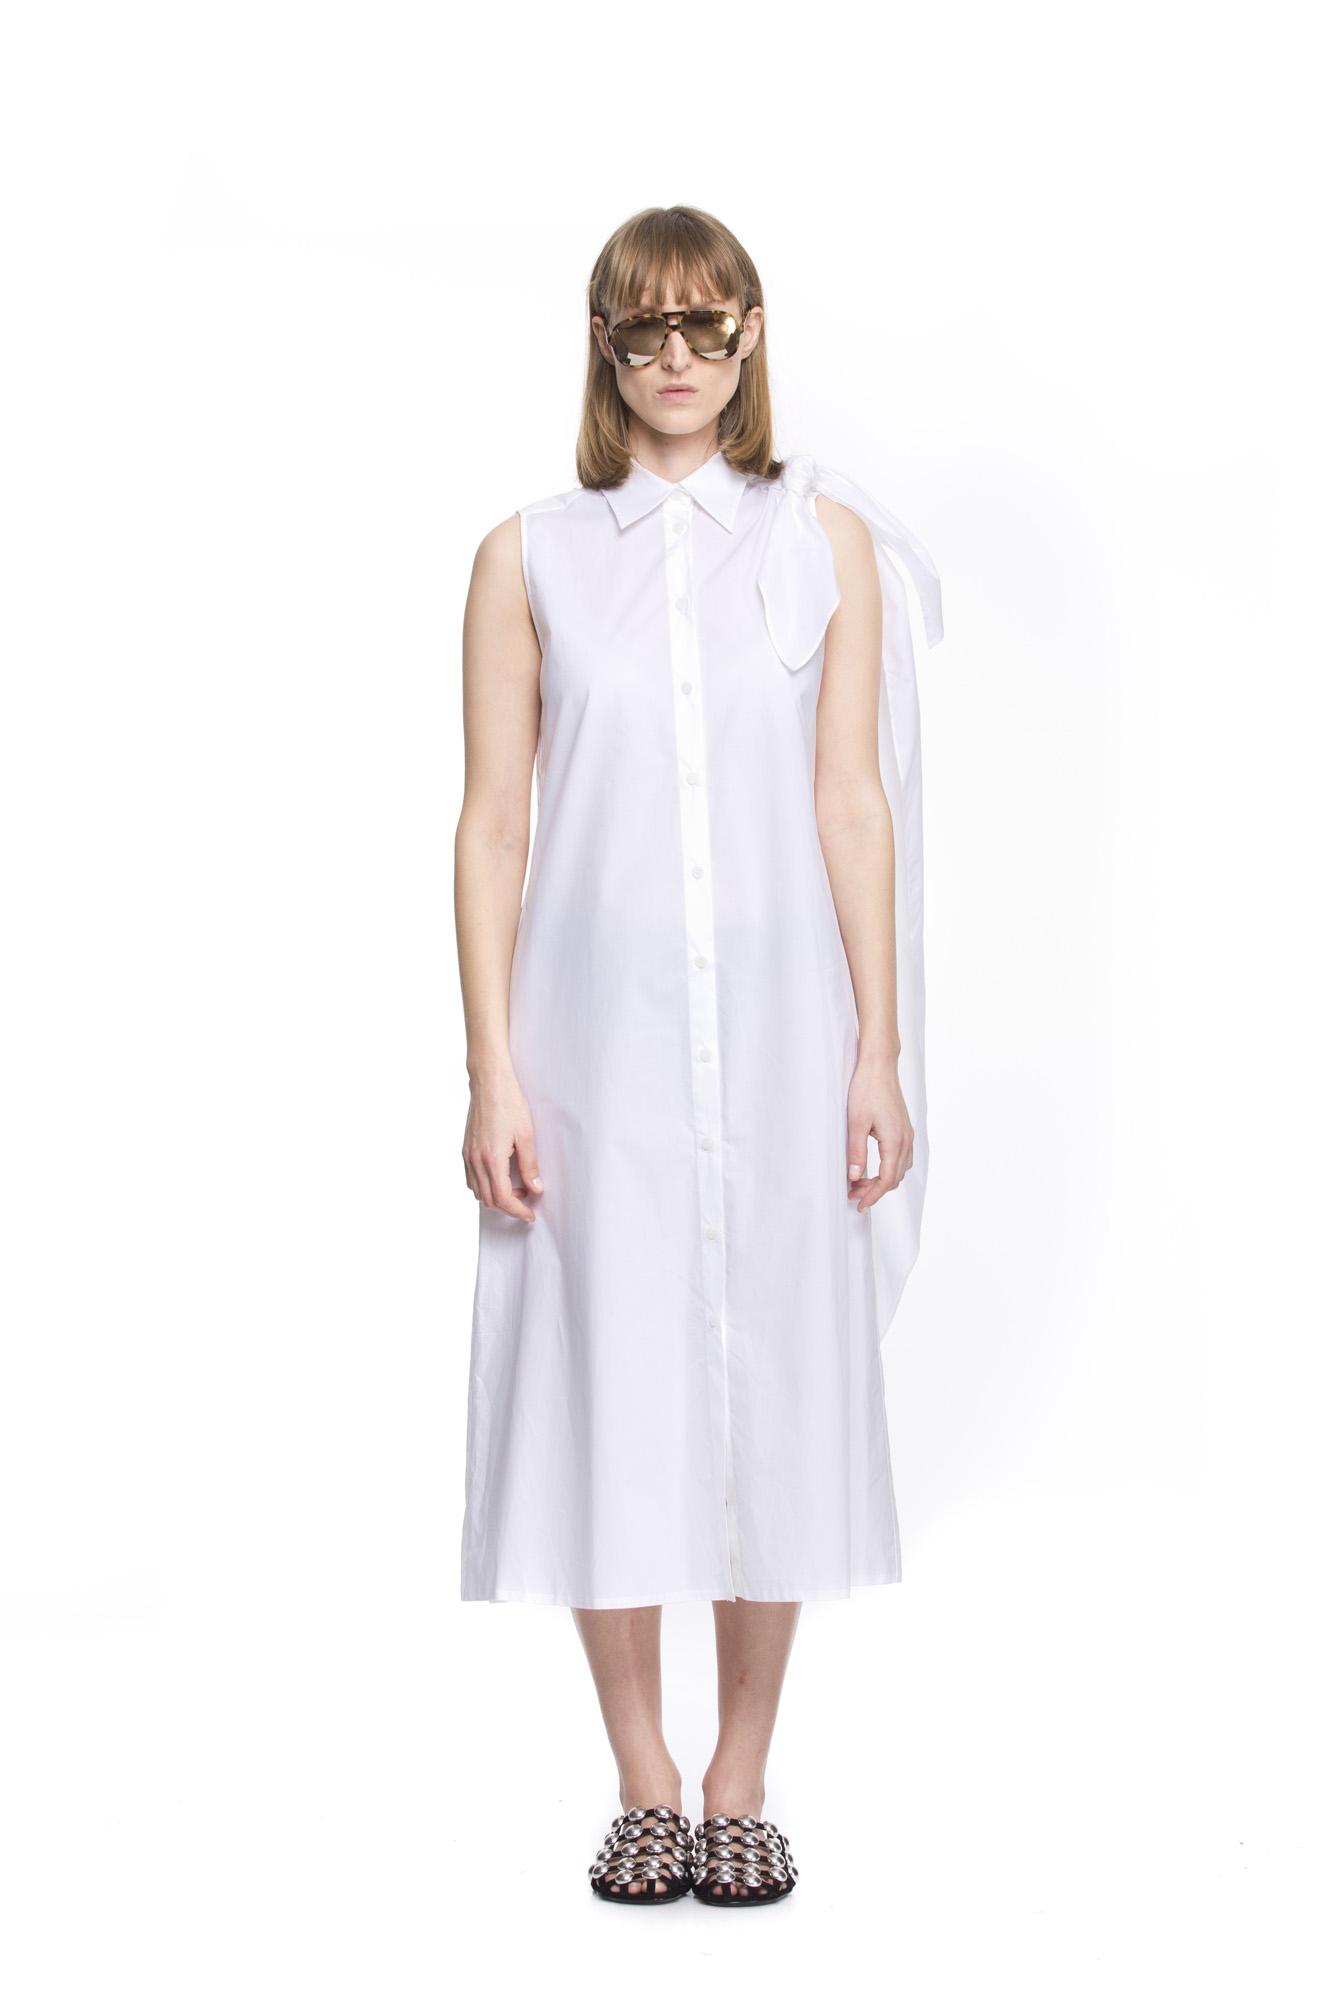 MM6 BOW WHITE DRESS